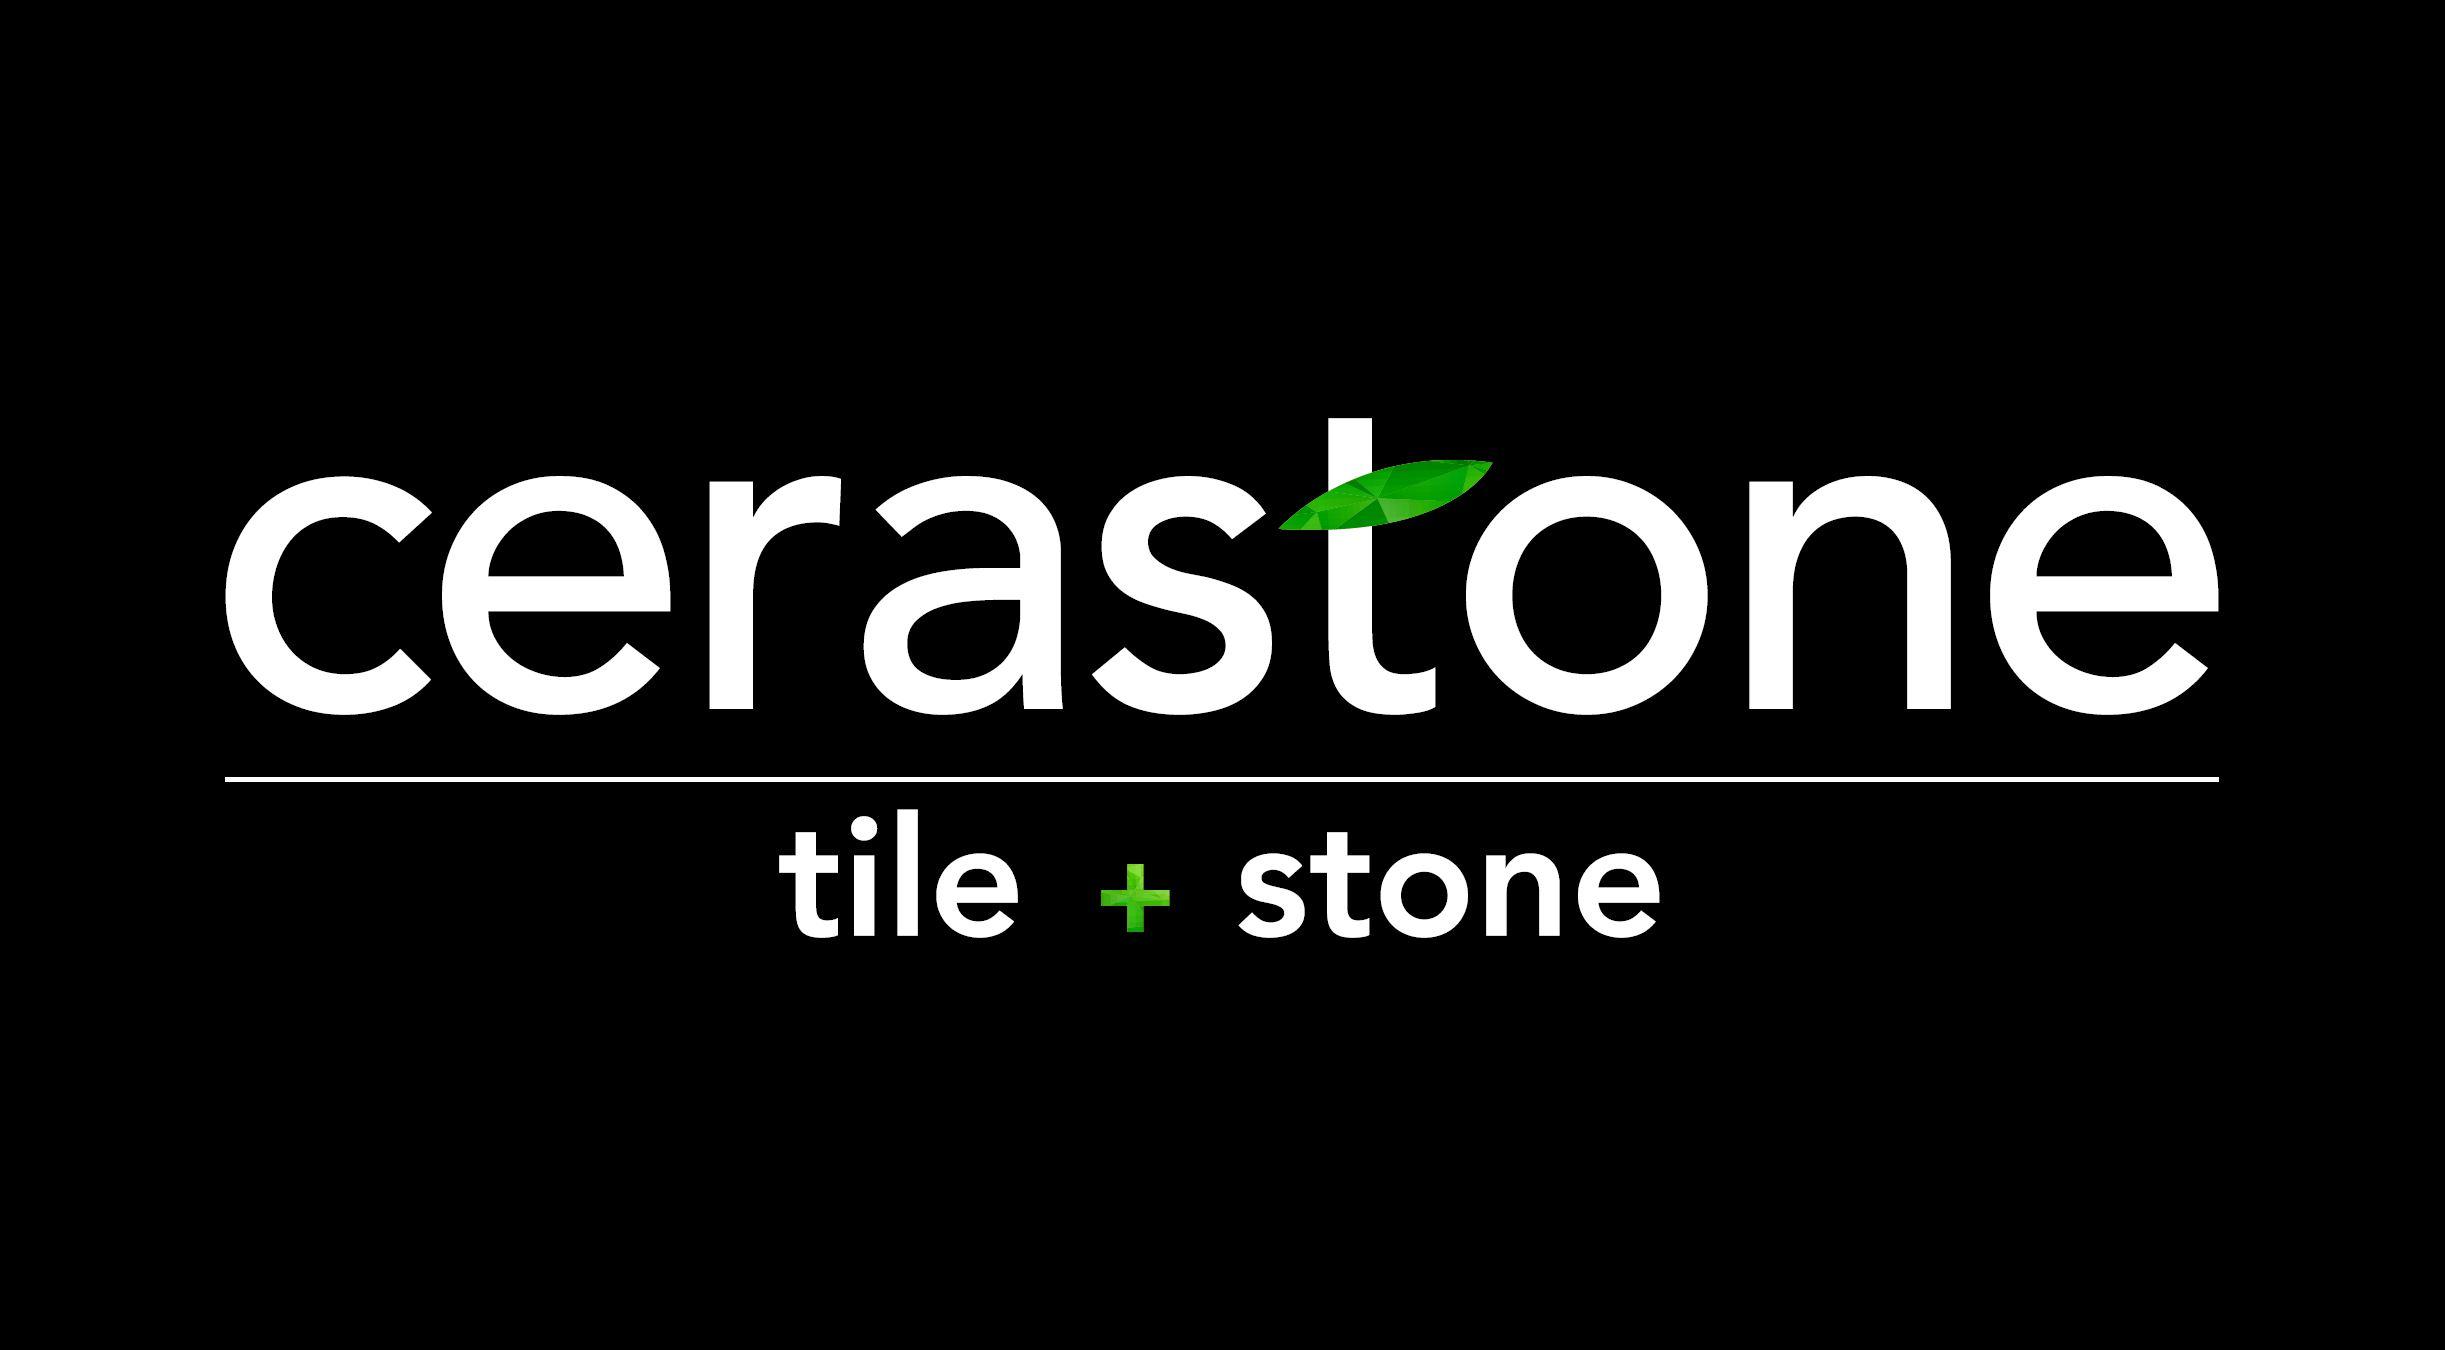 Cerastone